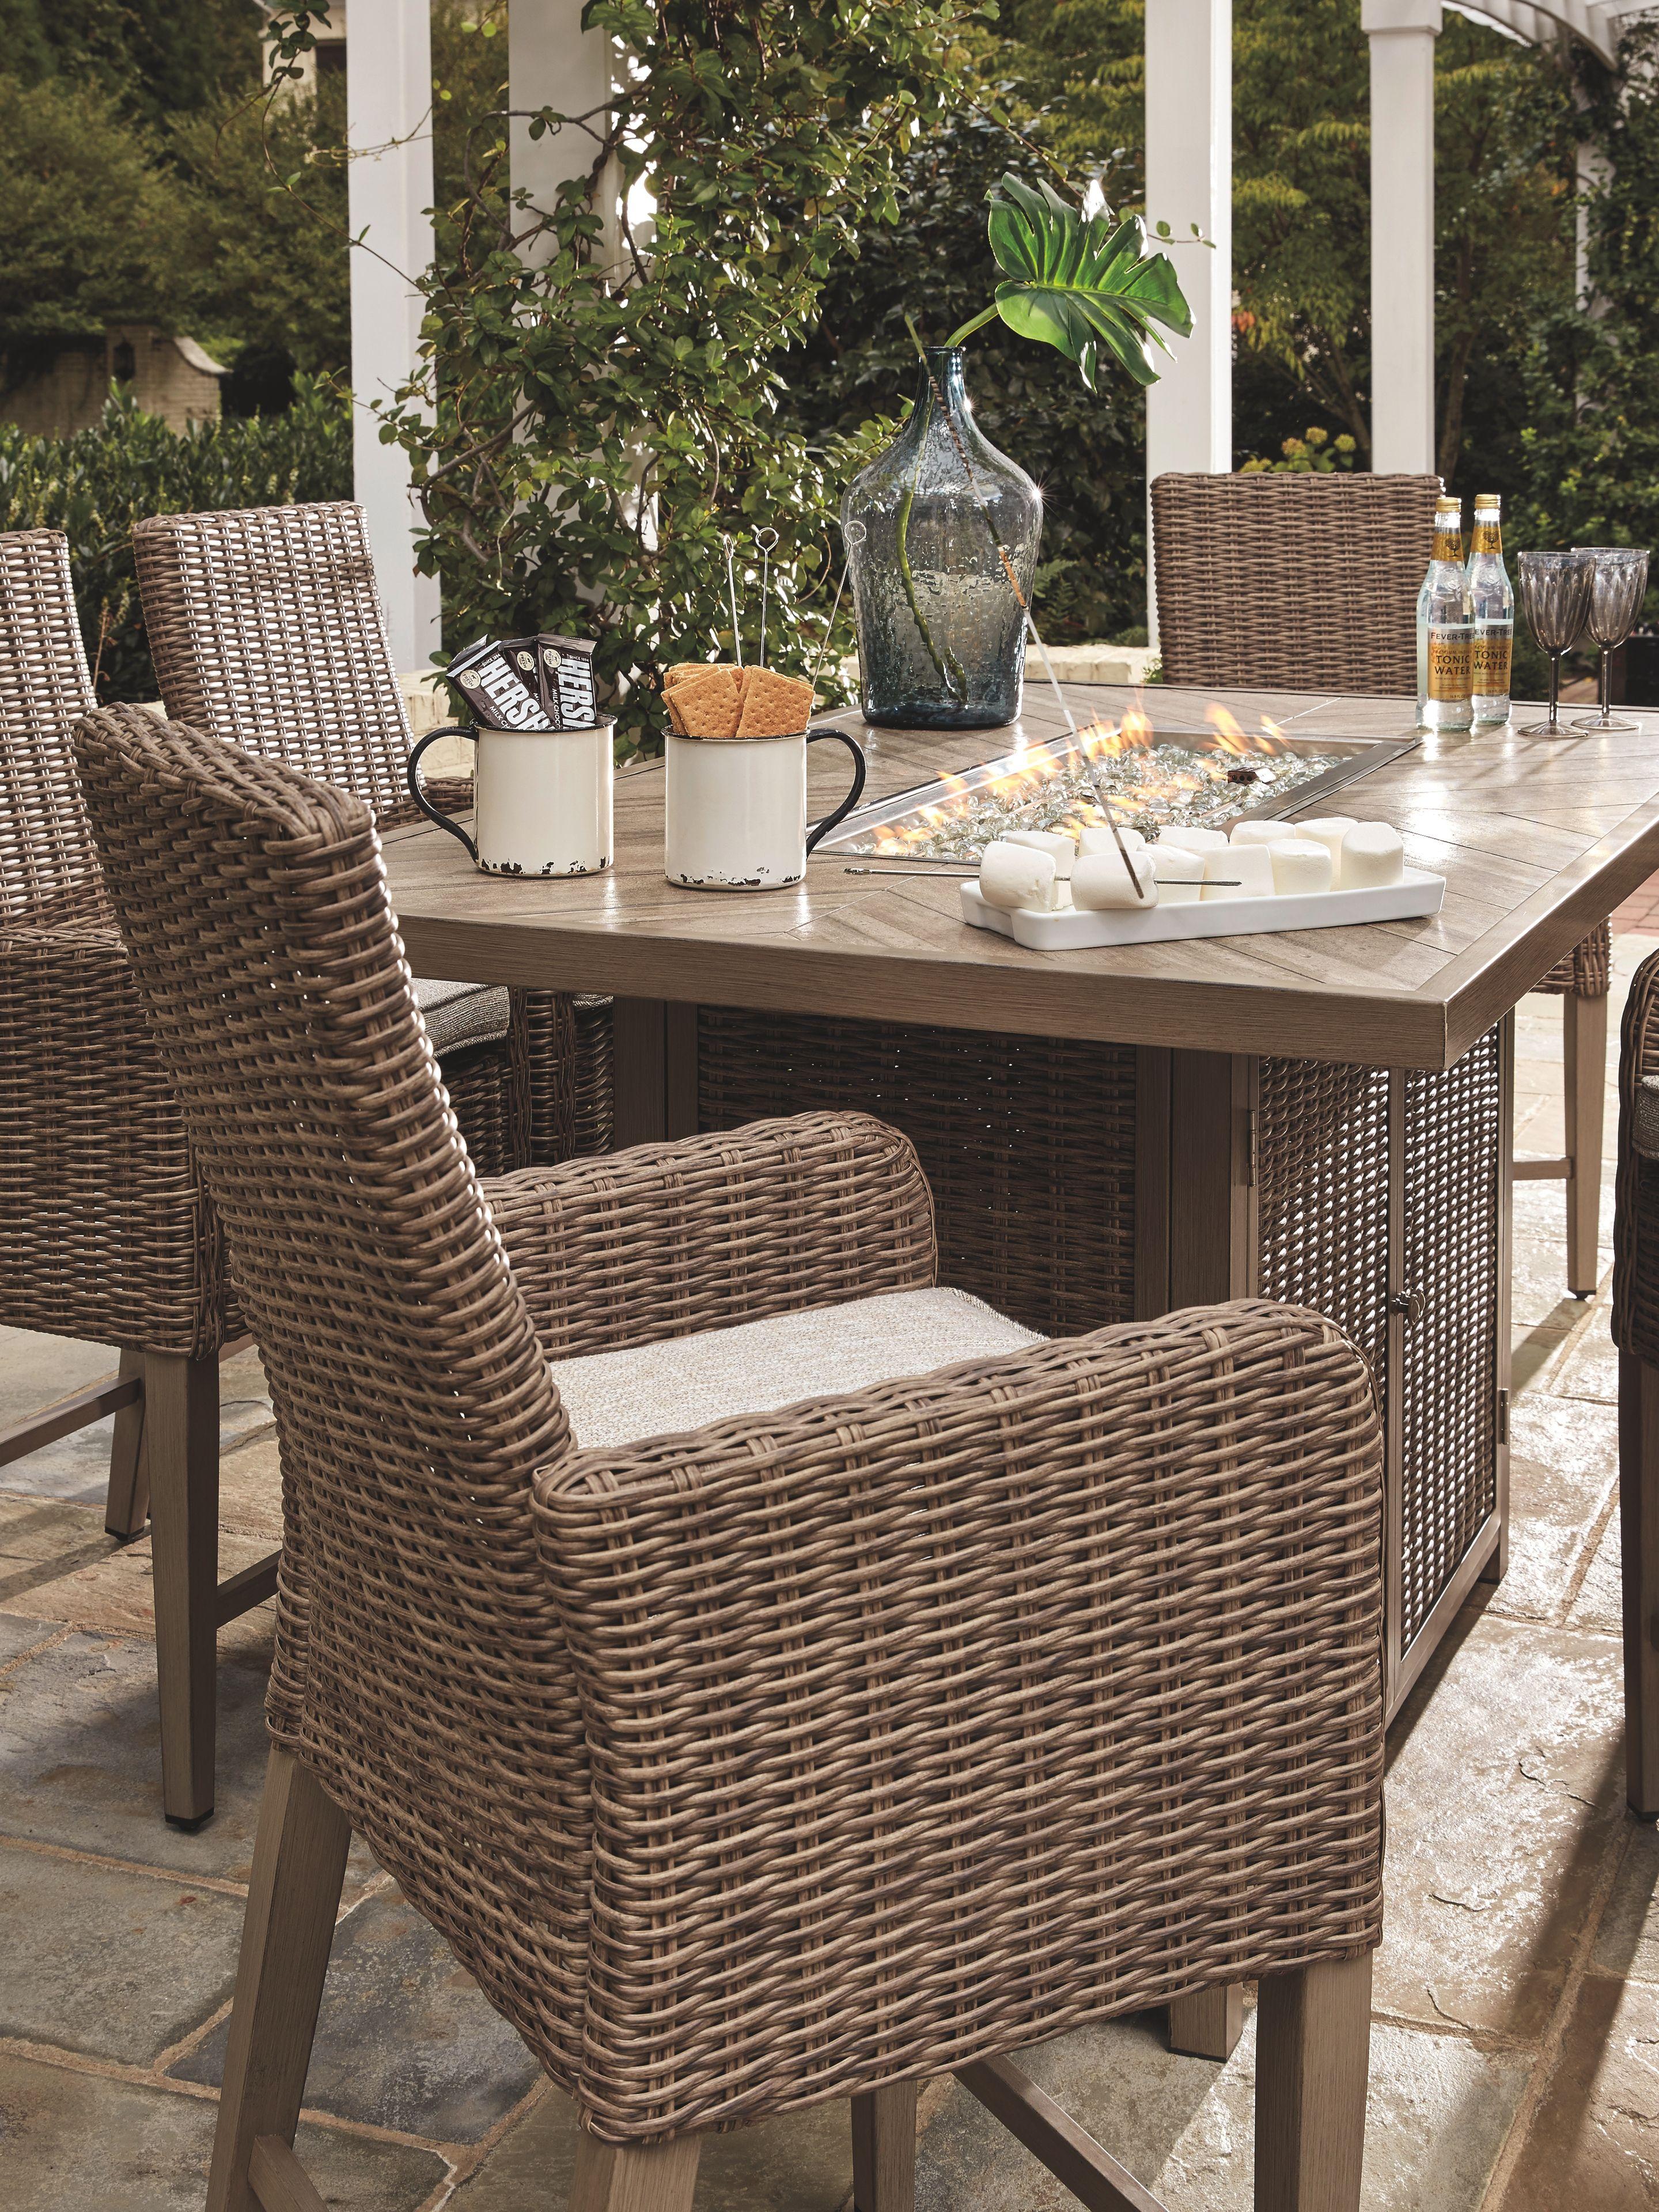 Sensational Beachcroft 5 Piece Outdoor Bar Table Set Beige Products Ibusinesslaw Wood Chair Design Ideas Ibusinesslaworg